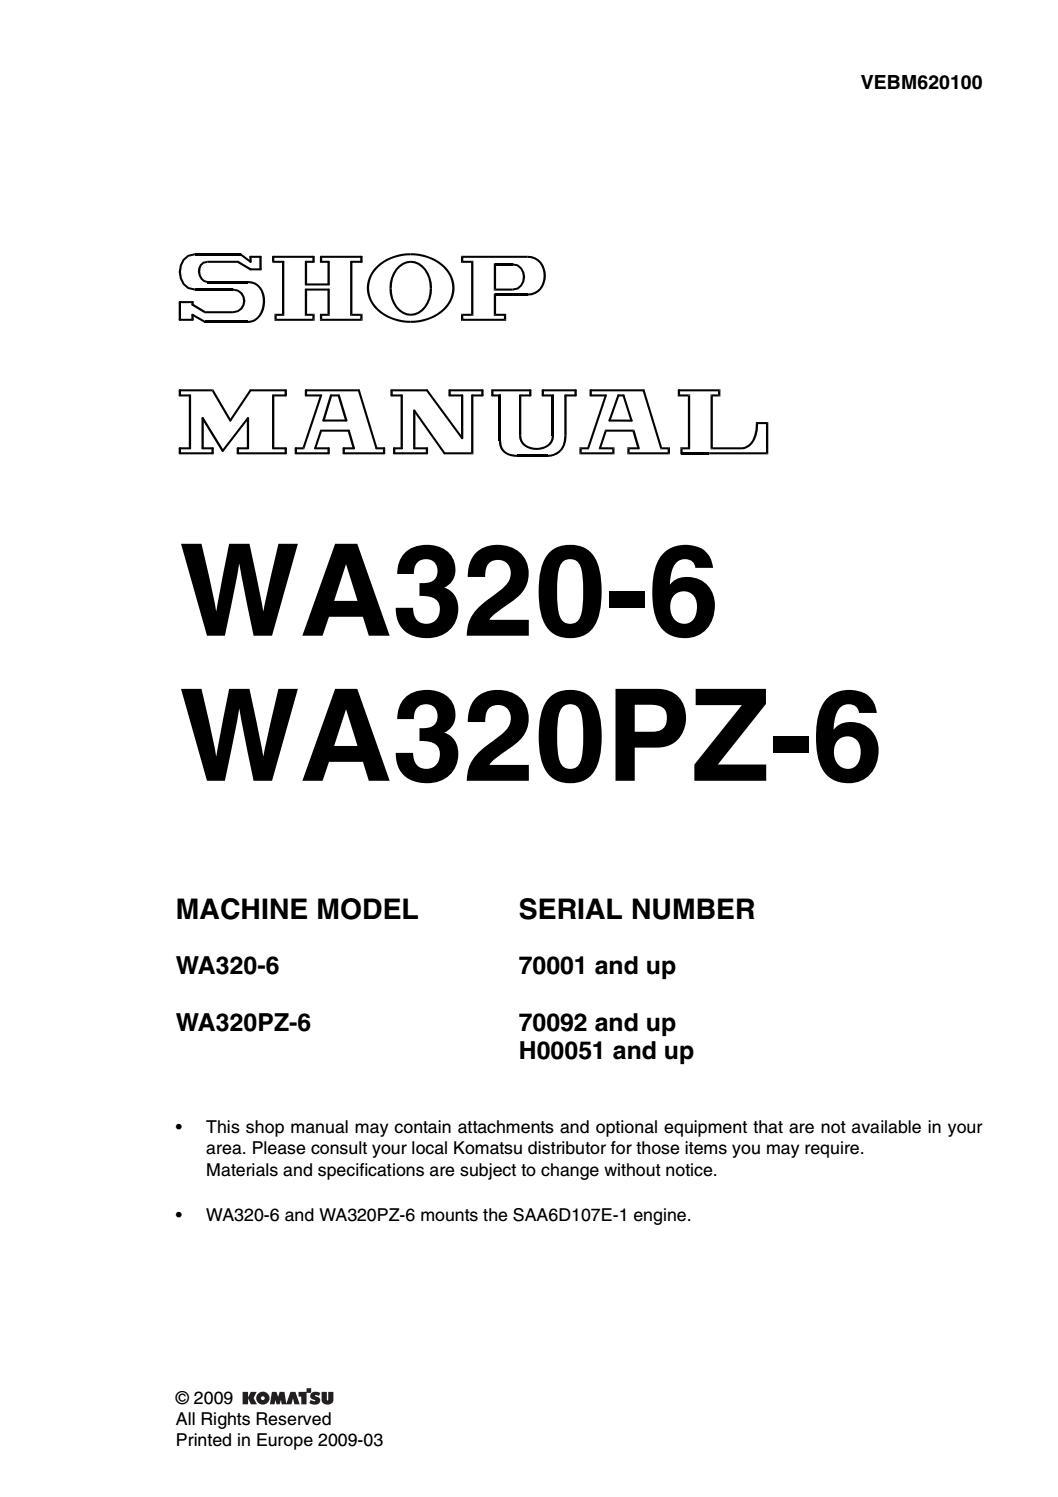 Komatsu WA320-6 Wheel Loader Service Repair Manual SN:70001